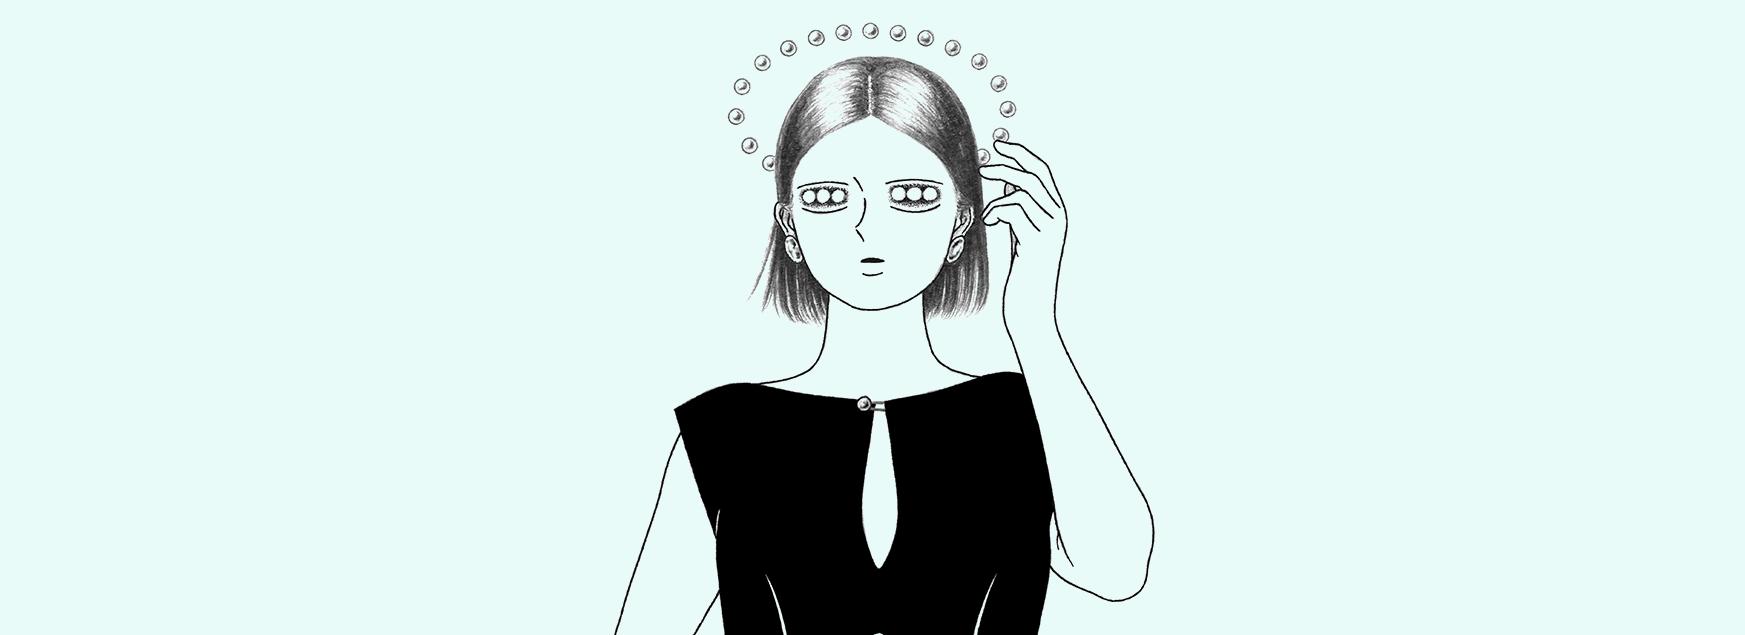 Illustration by Ai Teramoto